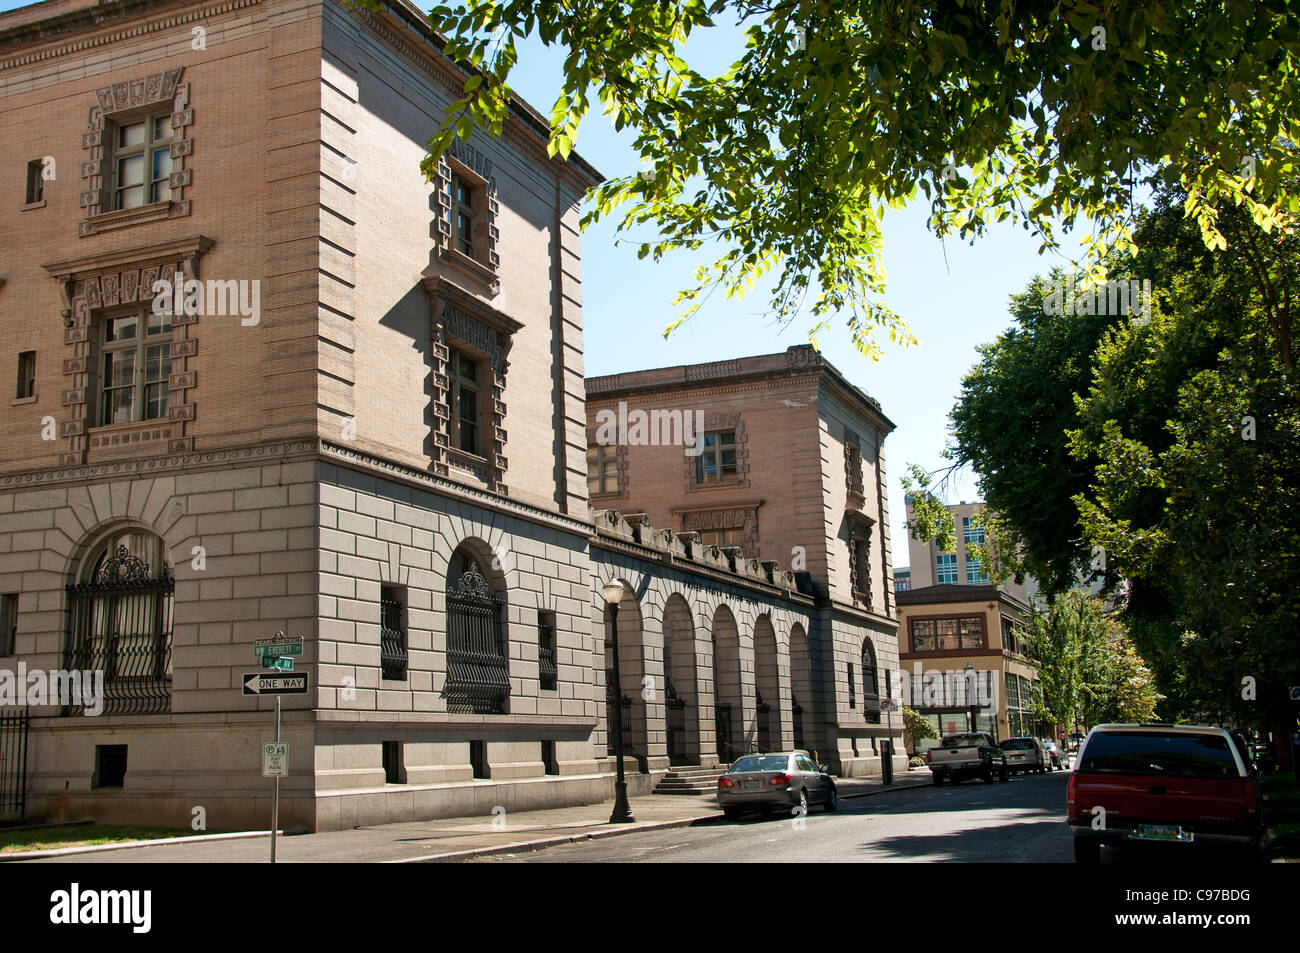 Portland Oregon United States Custom House of America USA - Stock Image